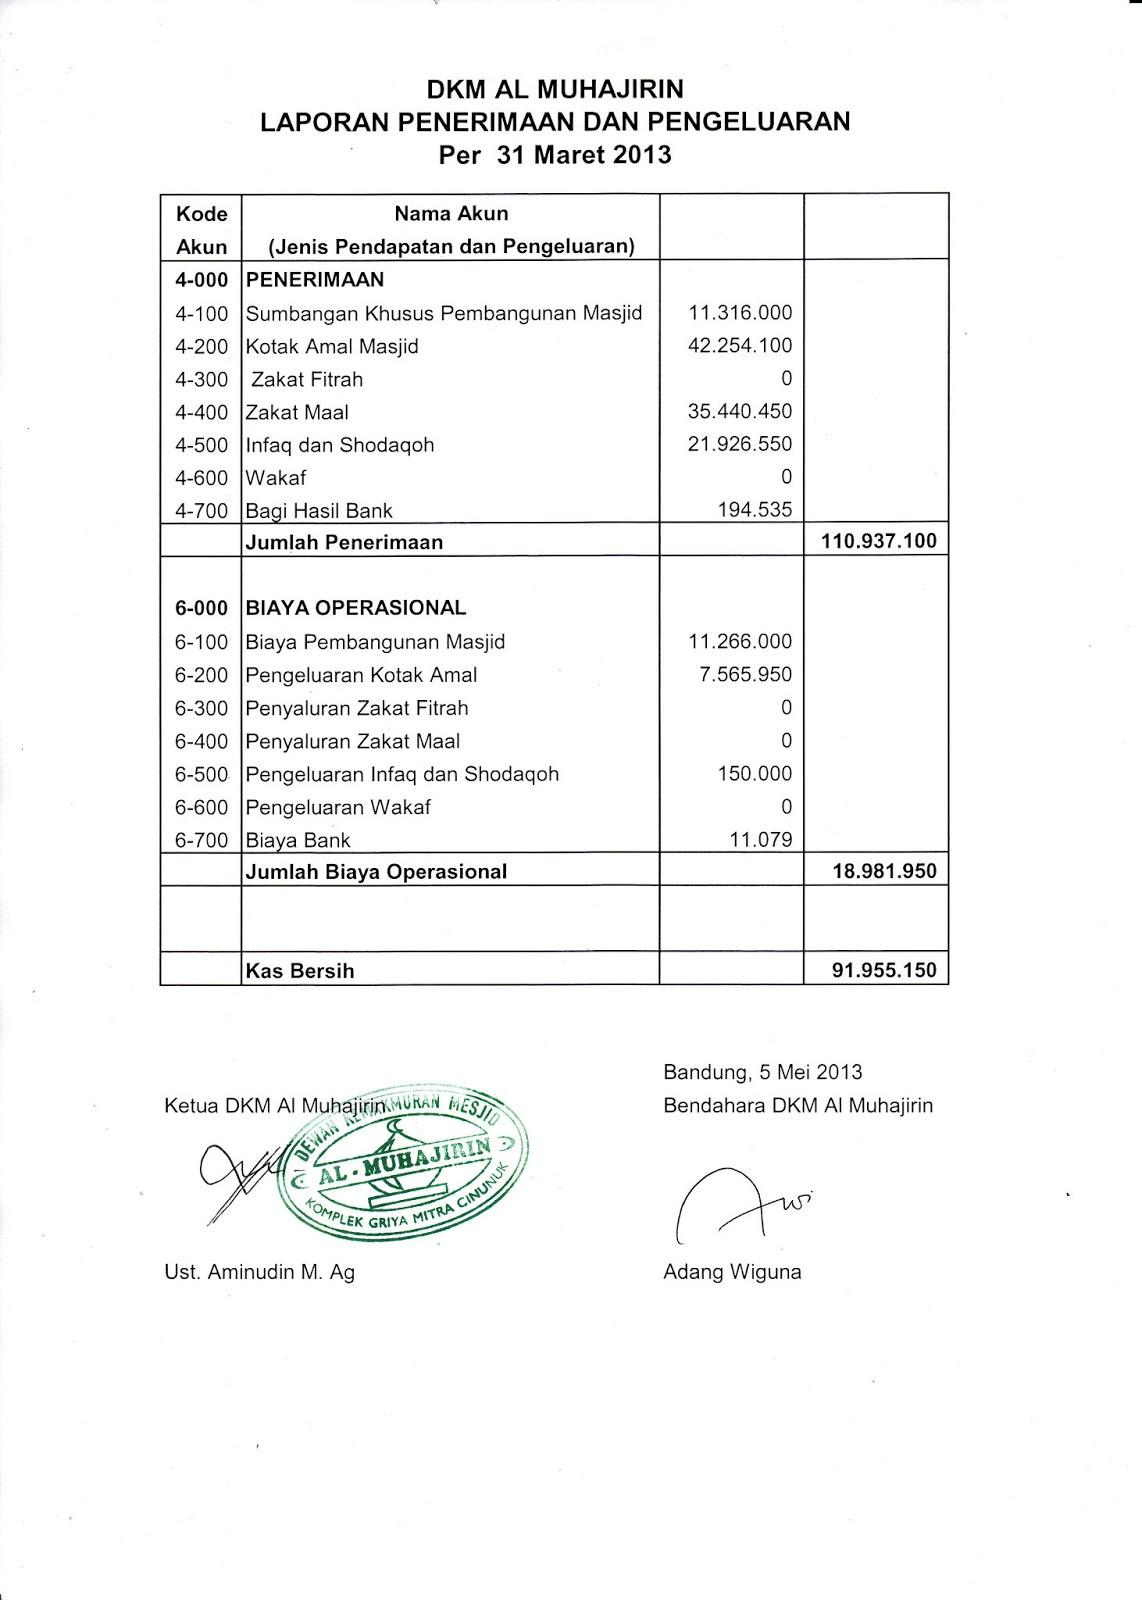 Contoh Laporan Keuangan Panitia Pembangunan Masjid Barisan Contoh